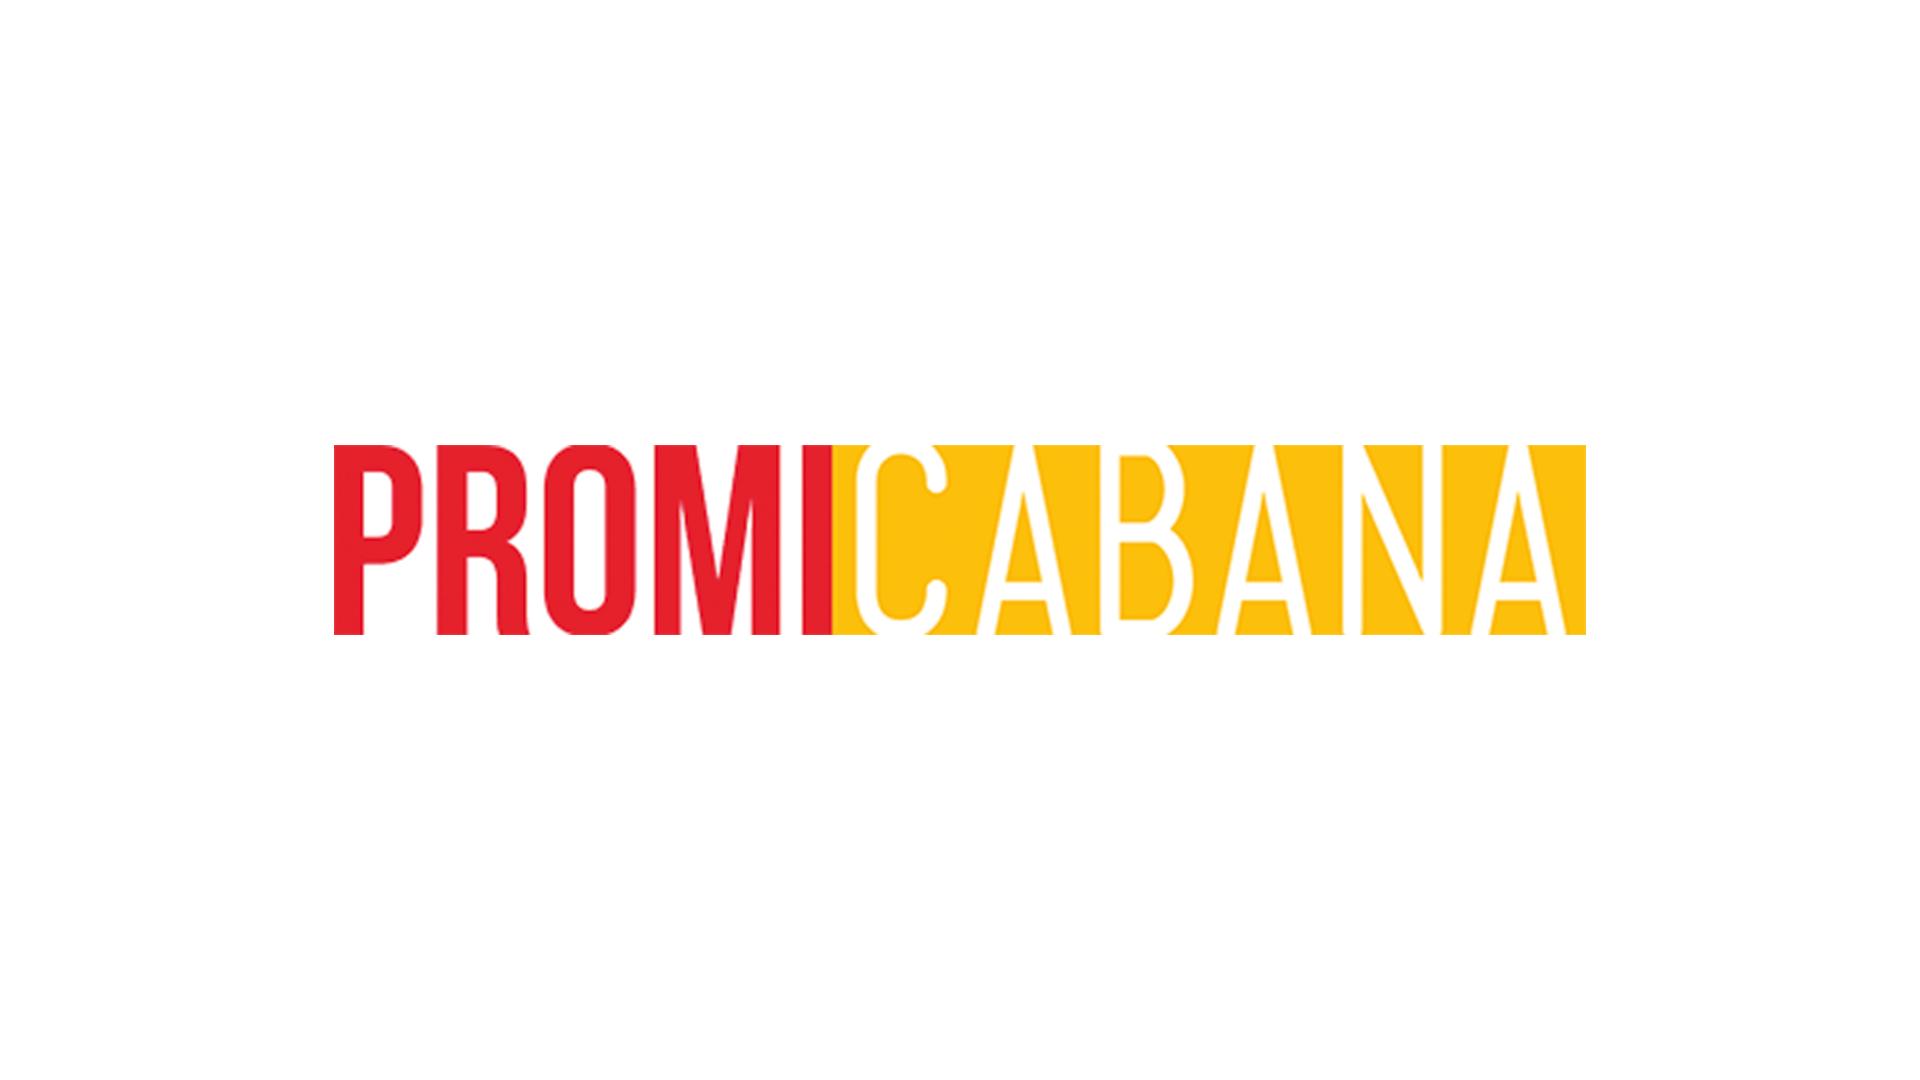 Harry-Styles-Kimberly-Stewart